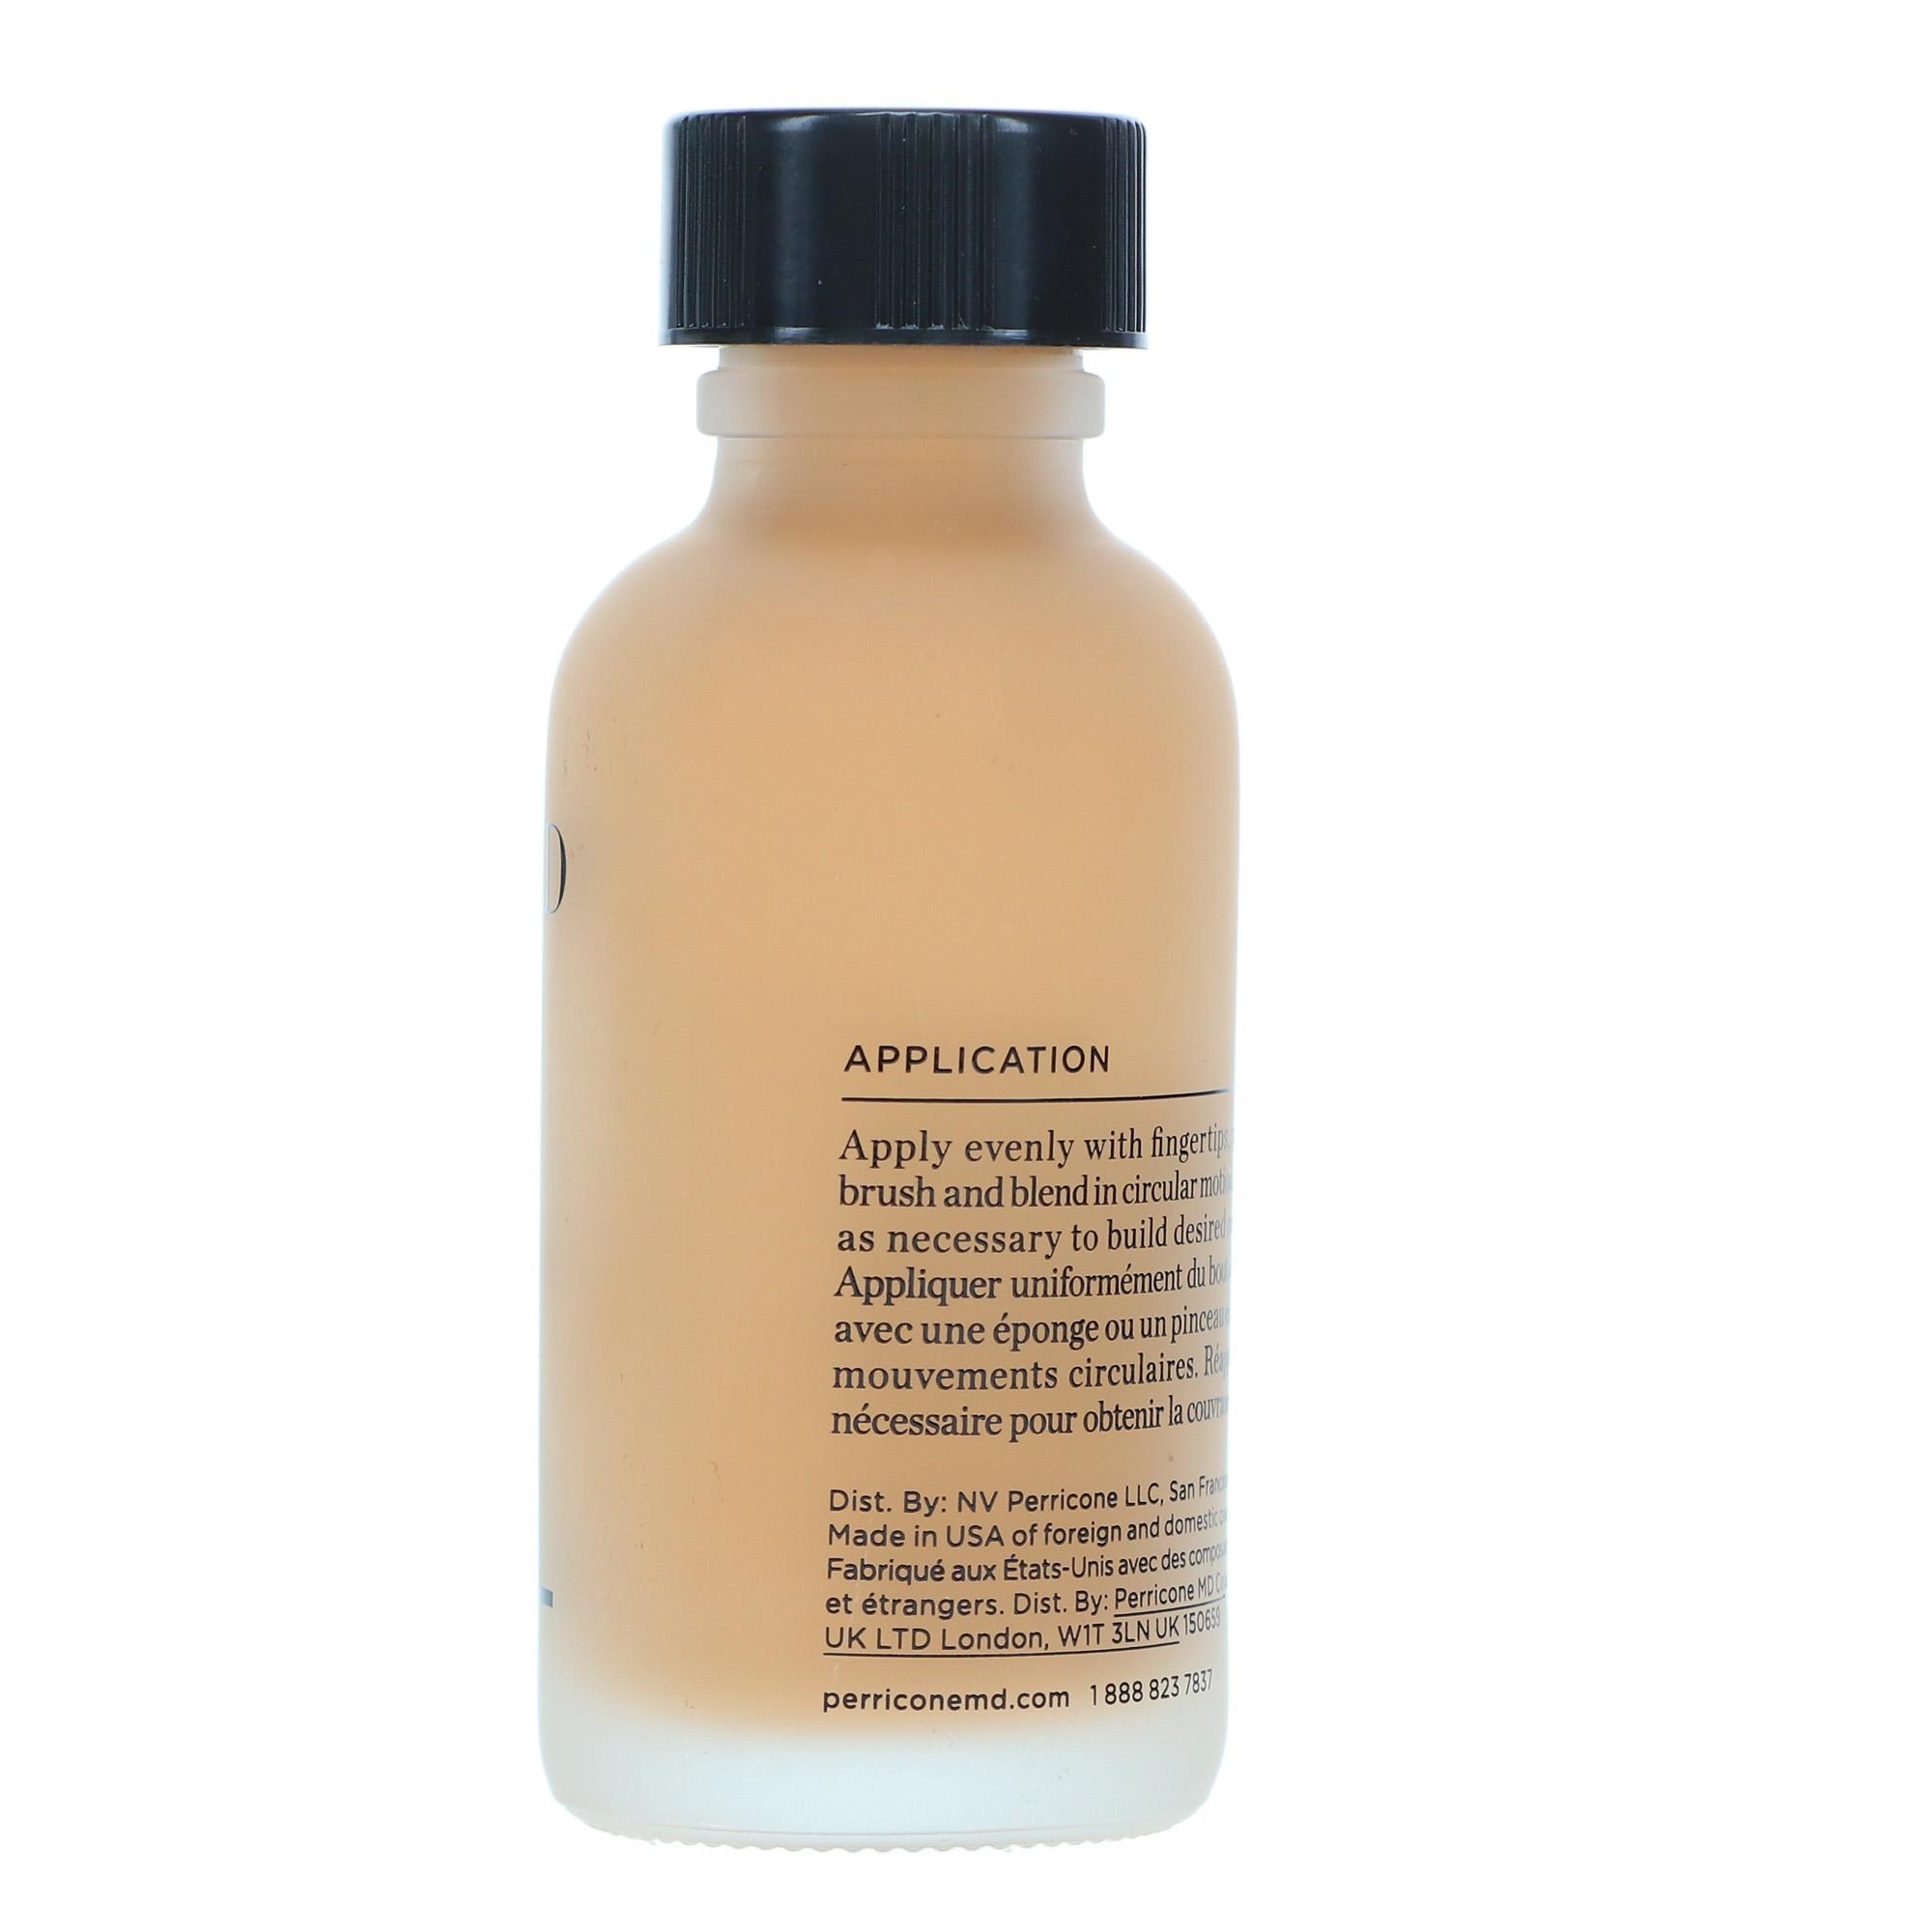 Perricone MD No Makeup Foundation Serum Nude (#2) 1 oz